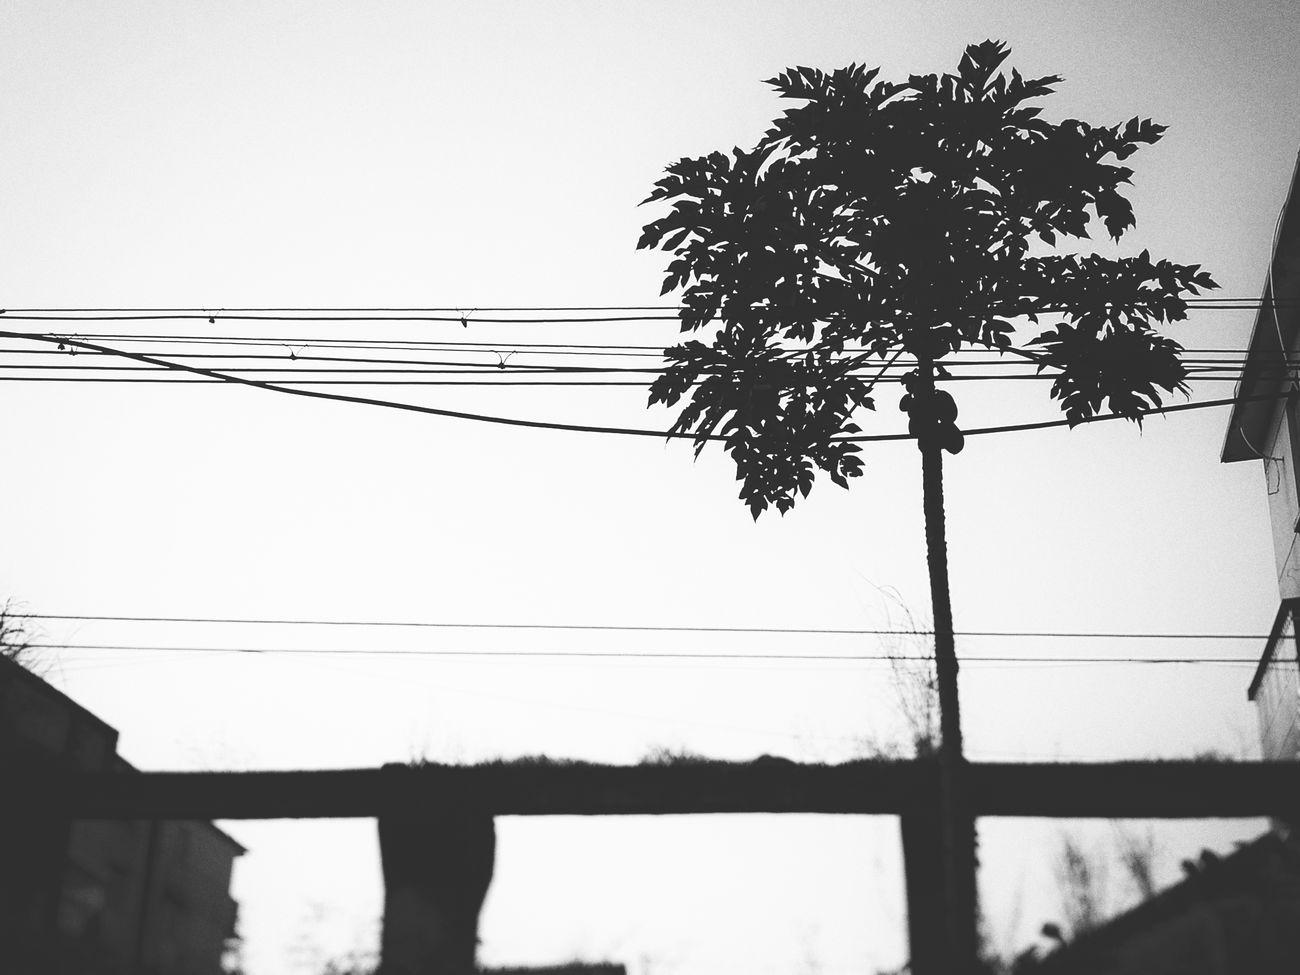 The Roadside Tree